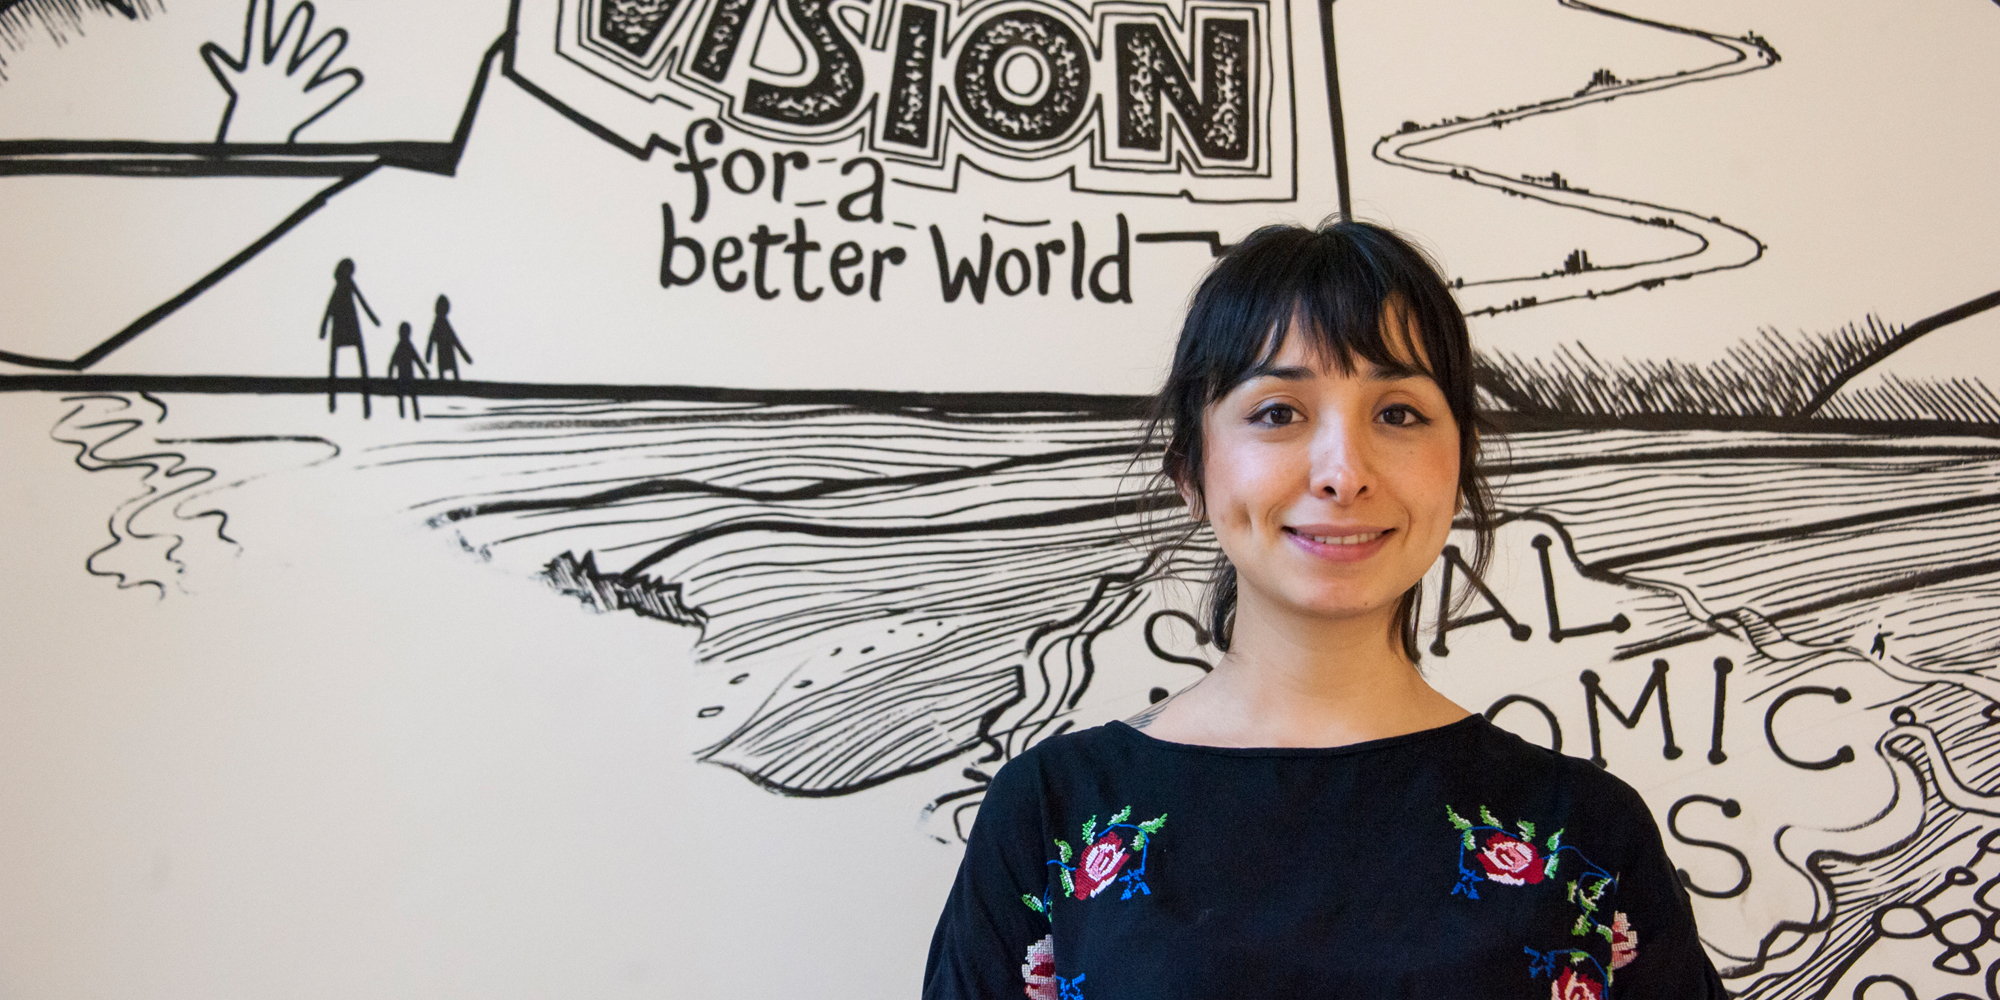 Montserrat Fuentes Romero, Mexico, participant in the GCLP 2018